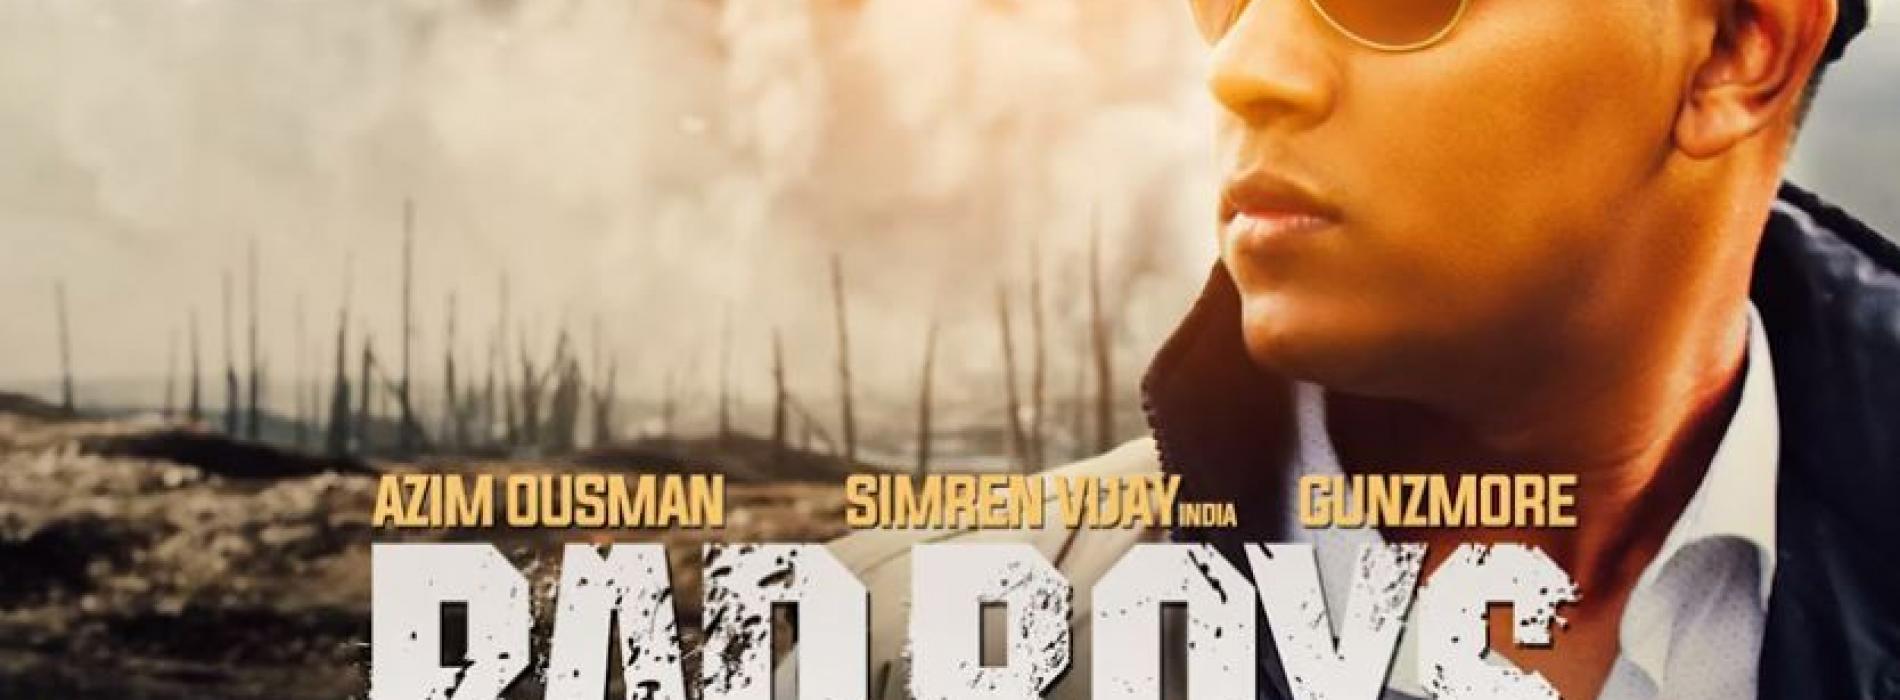 Azim Ousman – Bad Boys (Audio) ft Simren Vijay, Gunzmore   Remake